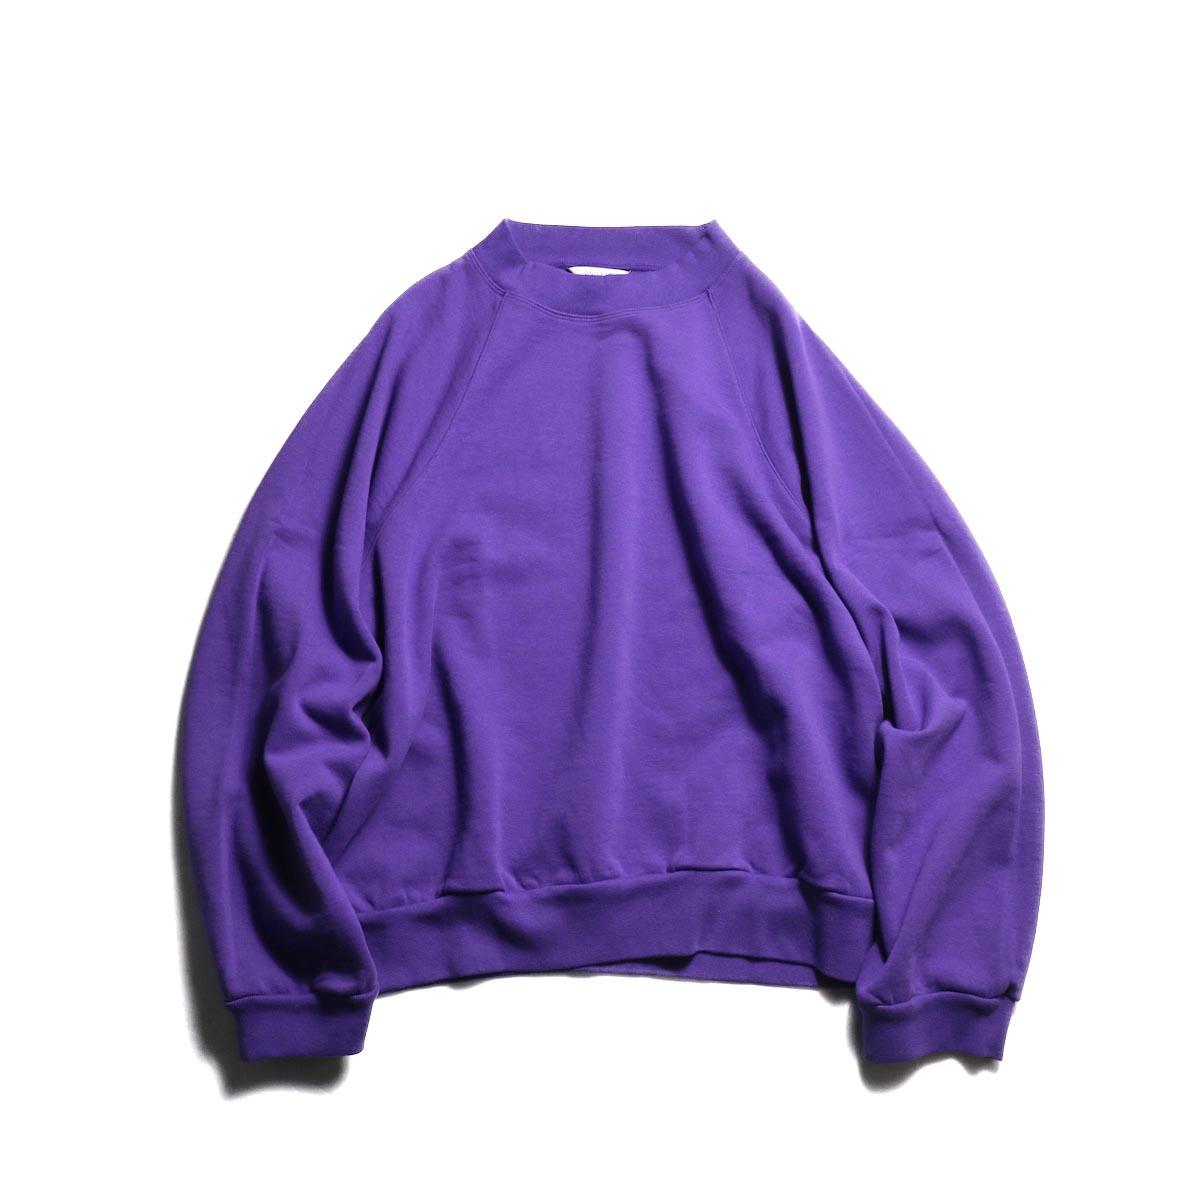 UNUSED / US1678 crew neck sweat shirt. -Purple